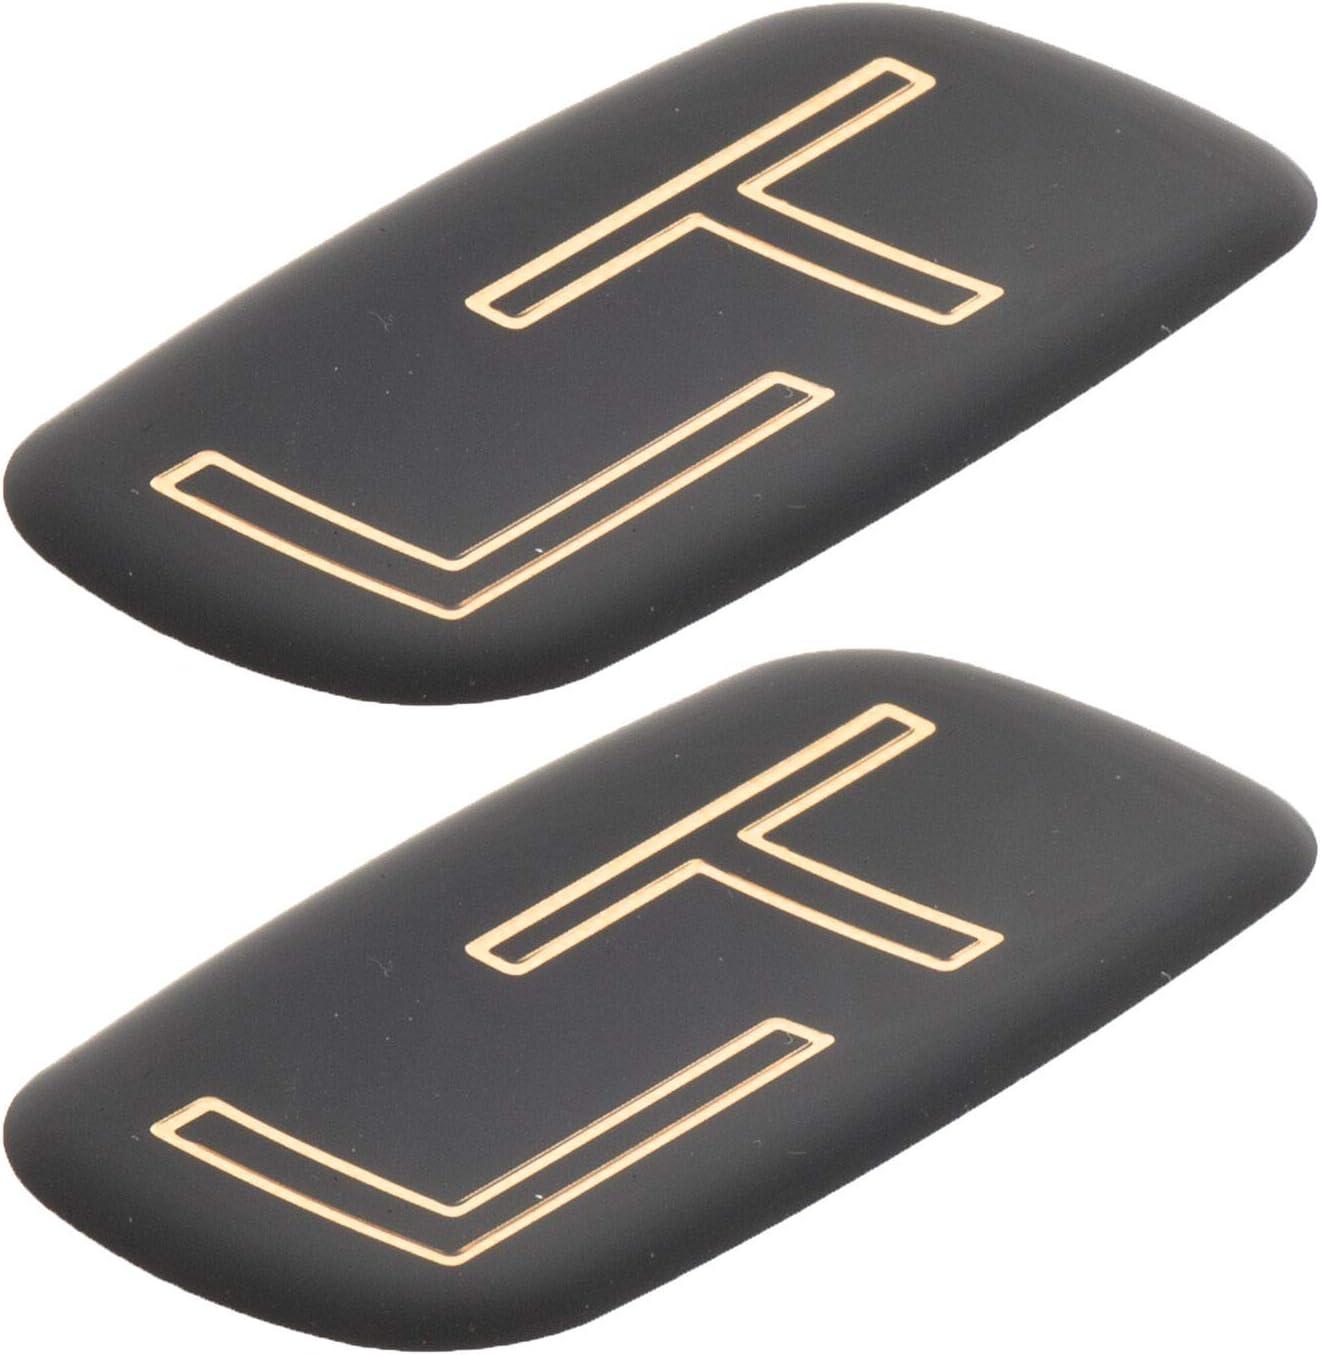 Gold Black Pair Set LT Rear Emblem Badge logo 99-07 Silverado Suburban Tahoe Bowtie